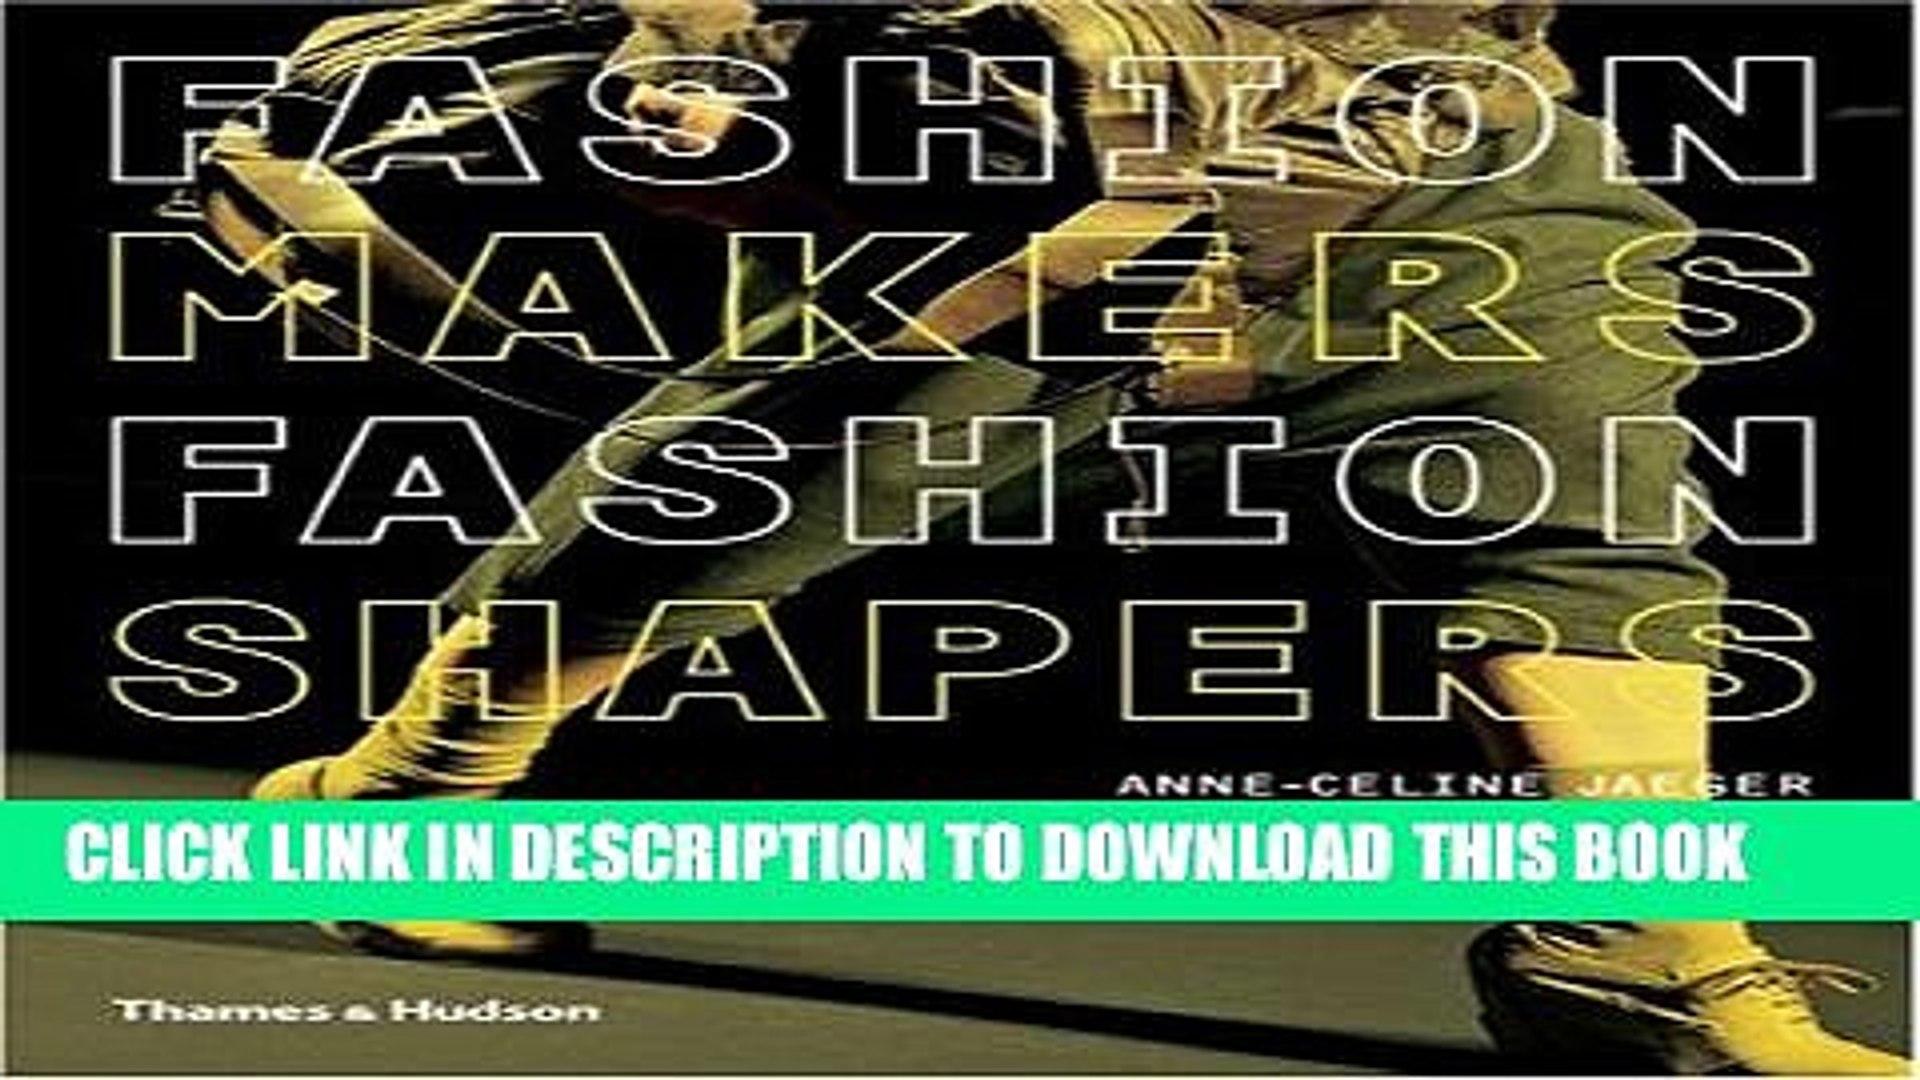 [PDF] Fashion Makers Fashion Shapers Full Online